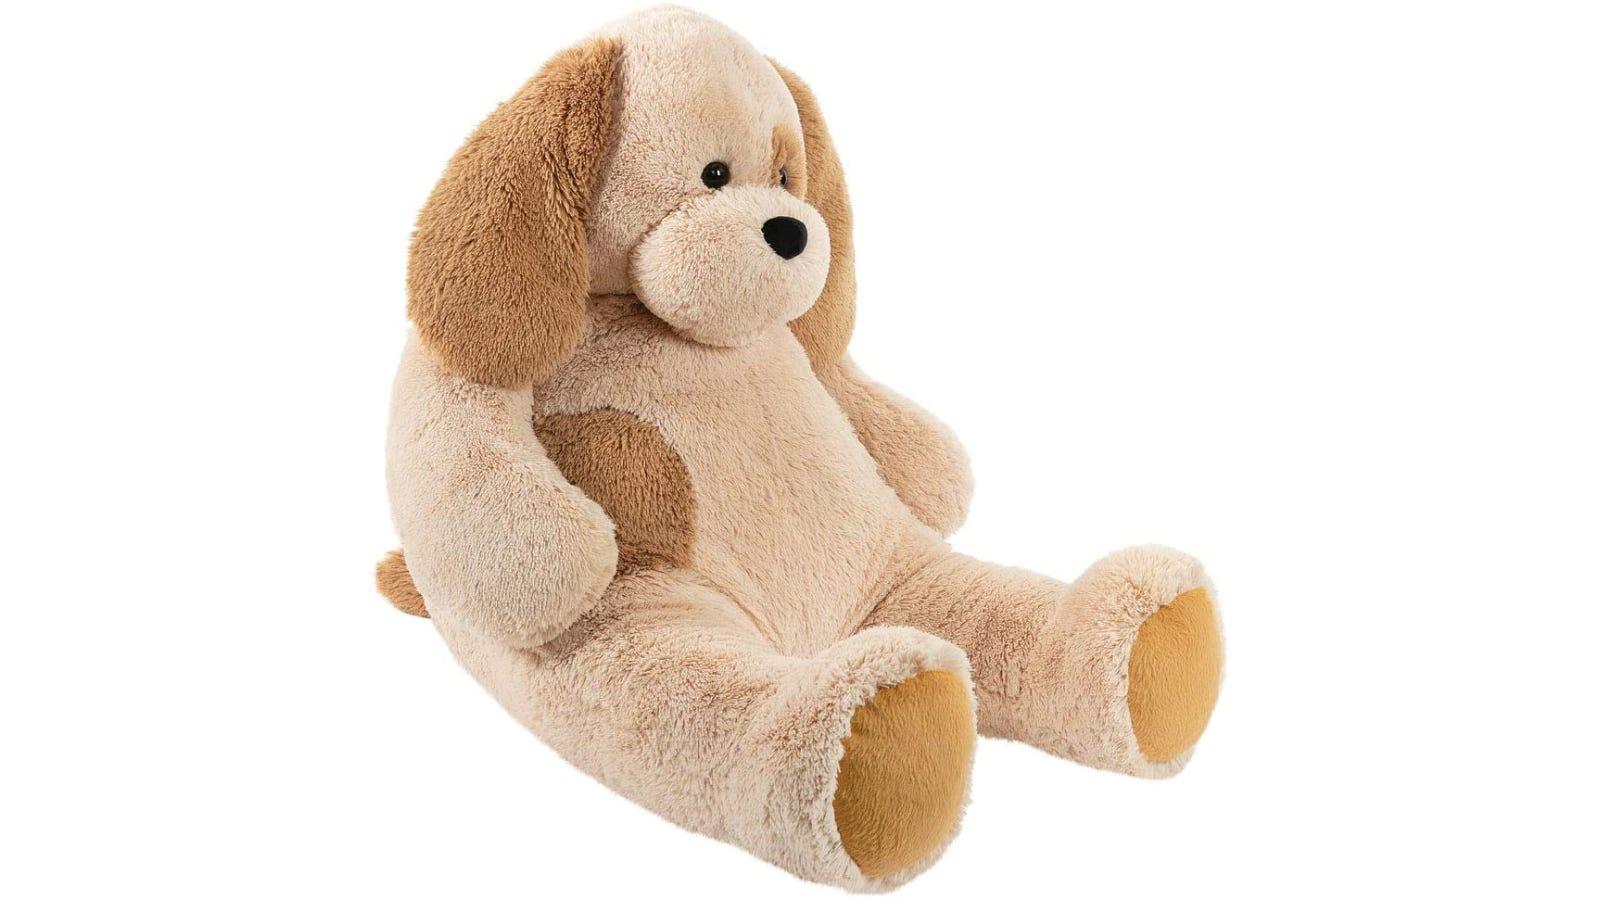 Large dog stuffed animal with brown fur.